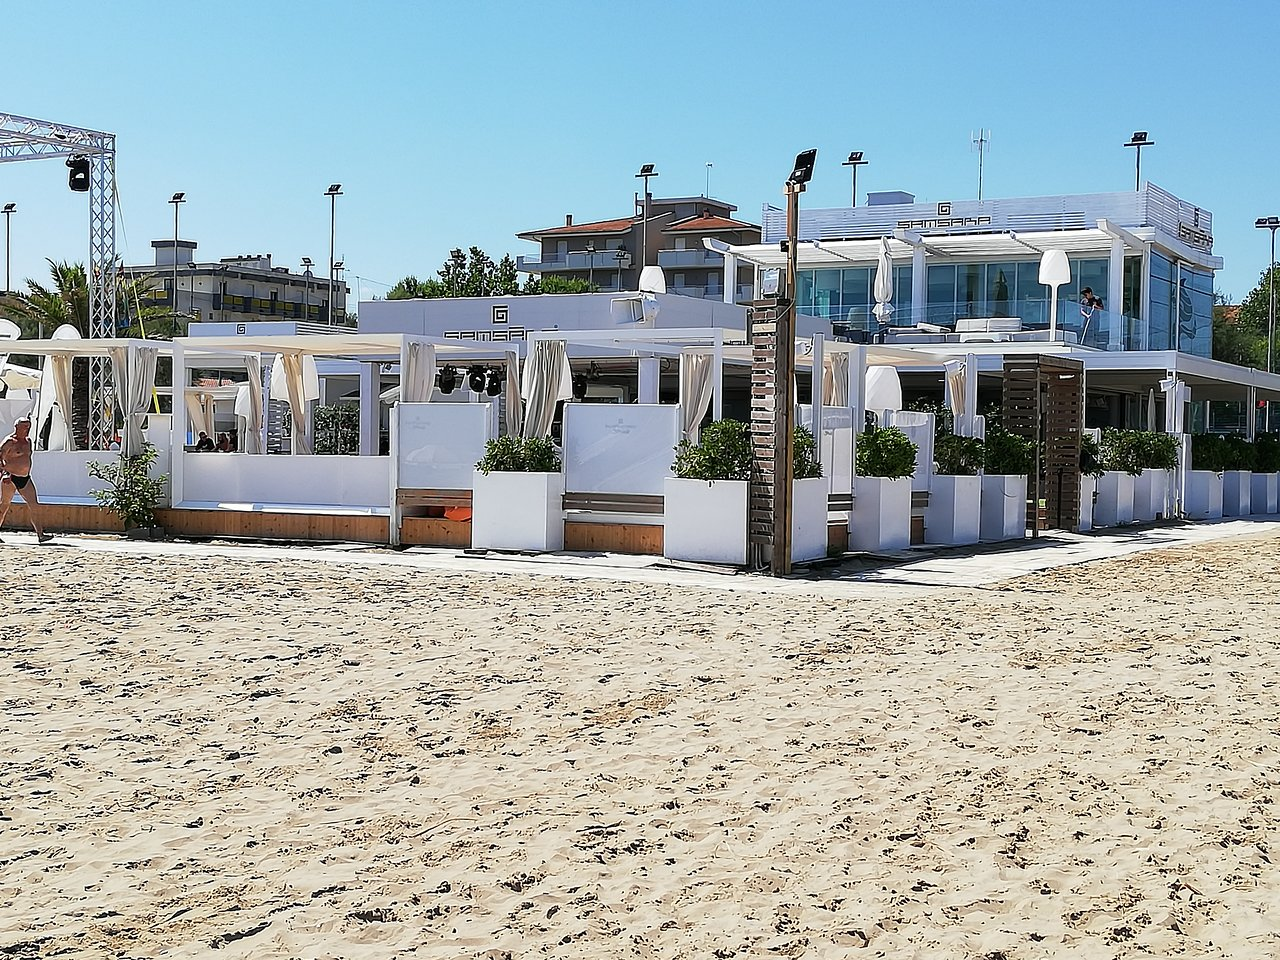 Samsara Beach Riccione 2020 All You Need To Know Before You Go